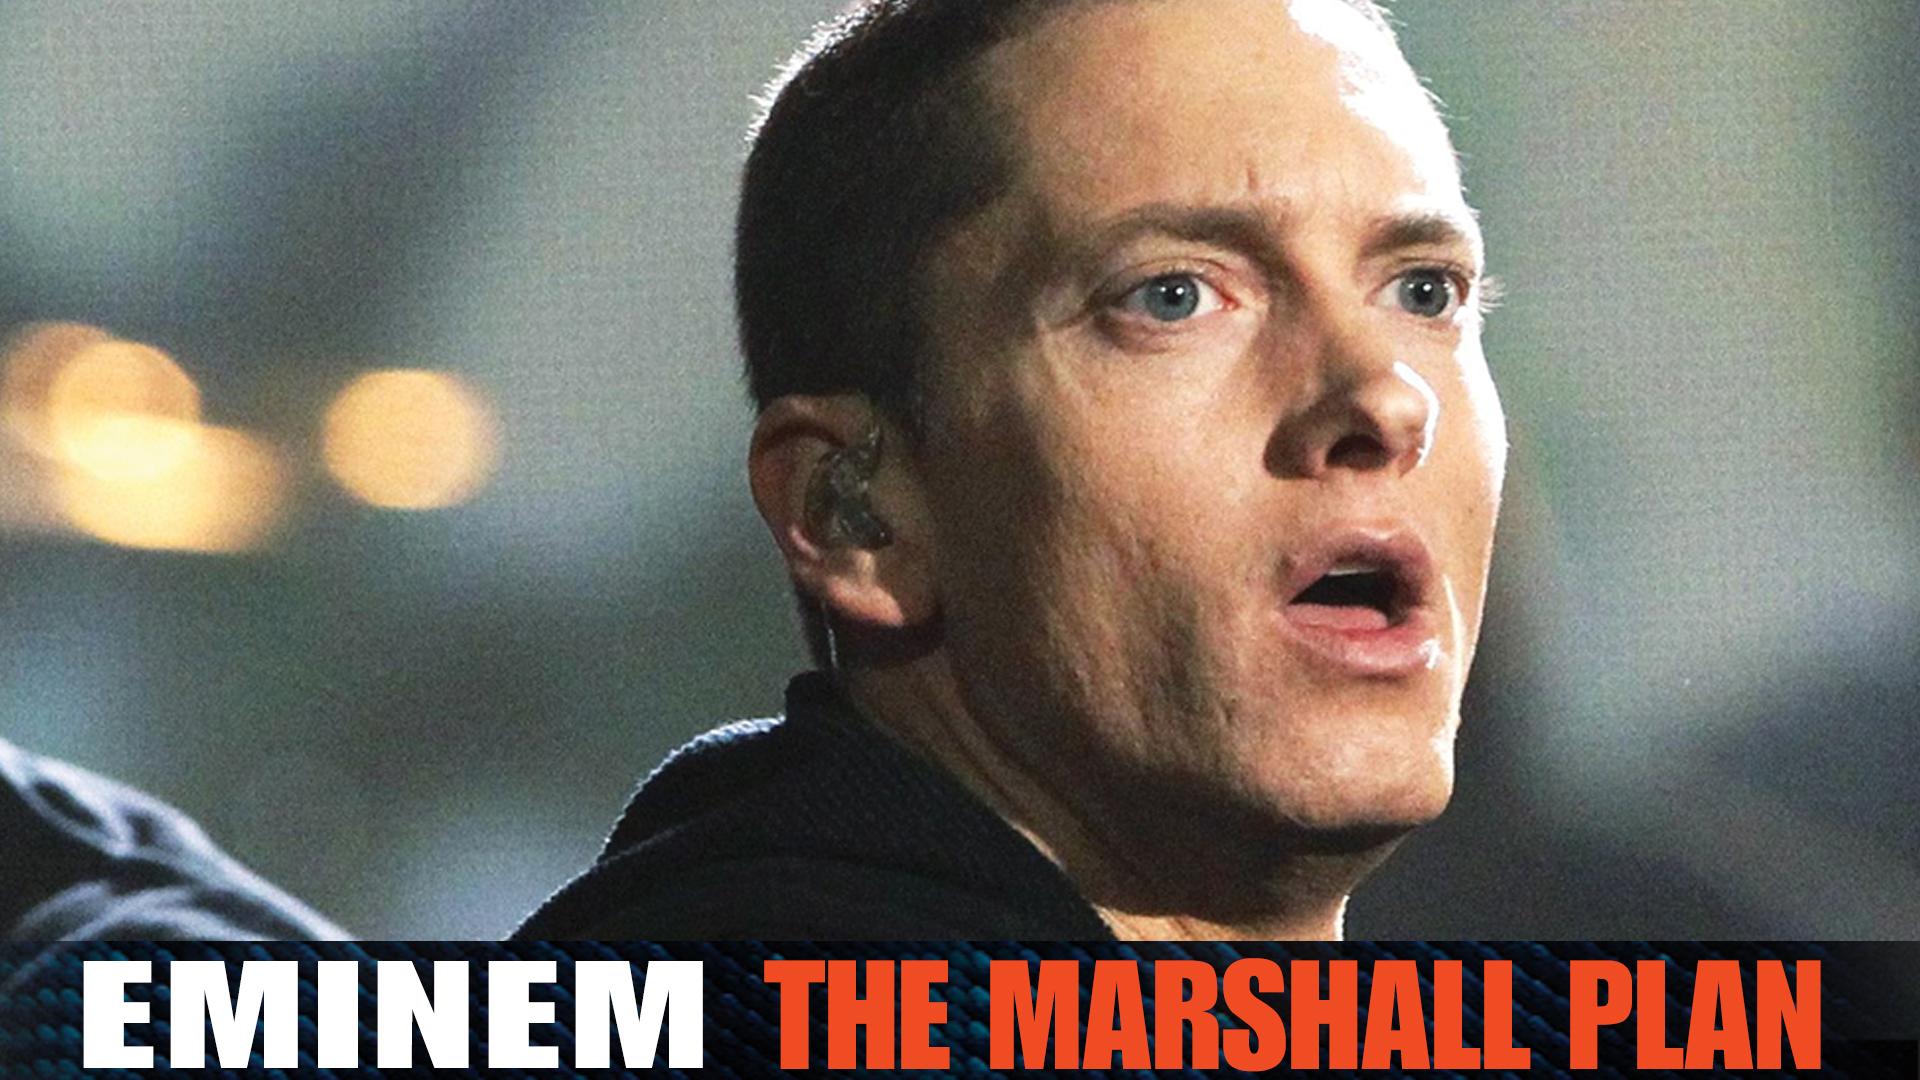 Eminem - The Marshall Plan